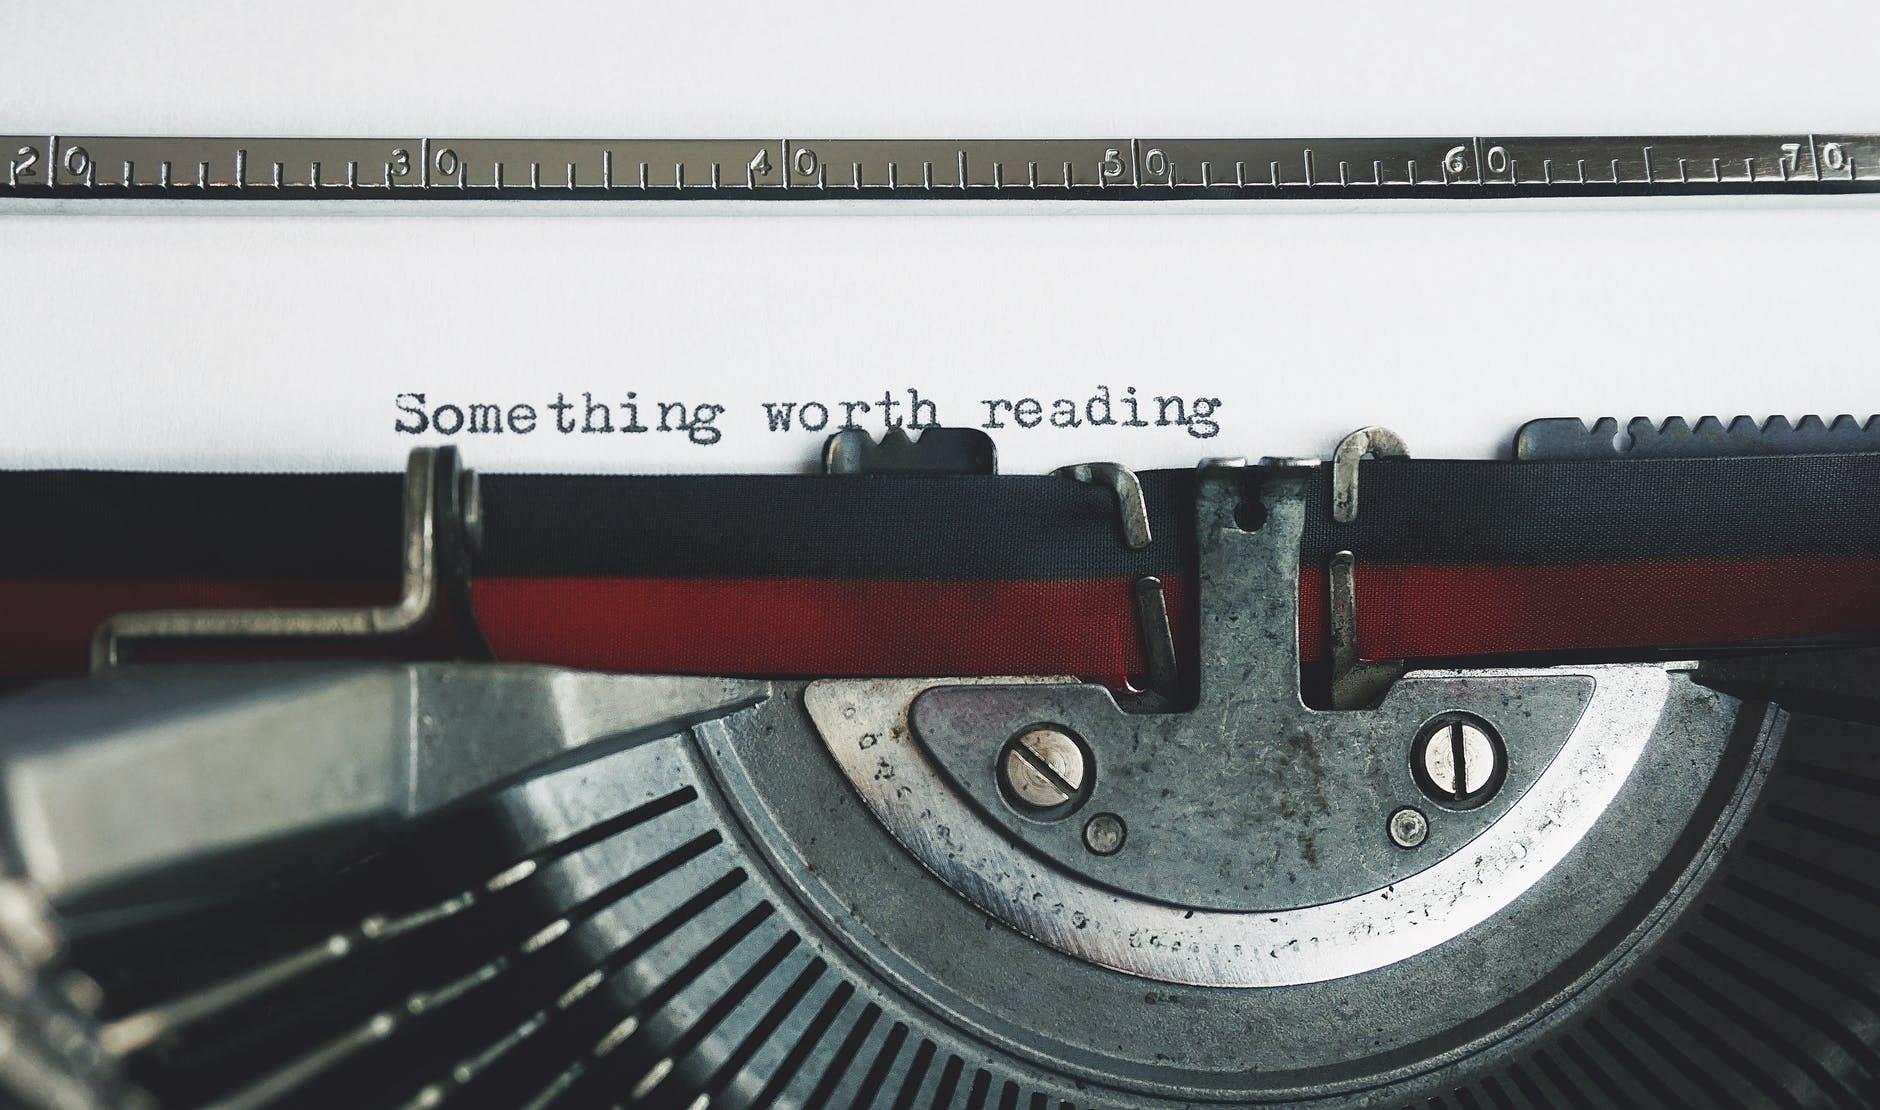 ...and something worth writing.